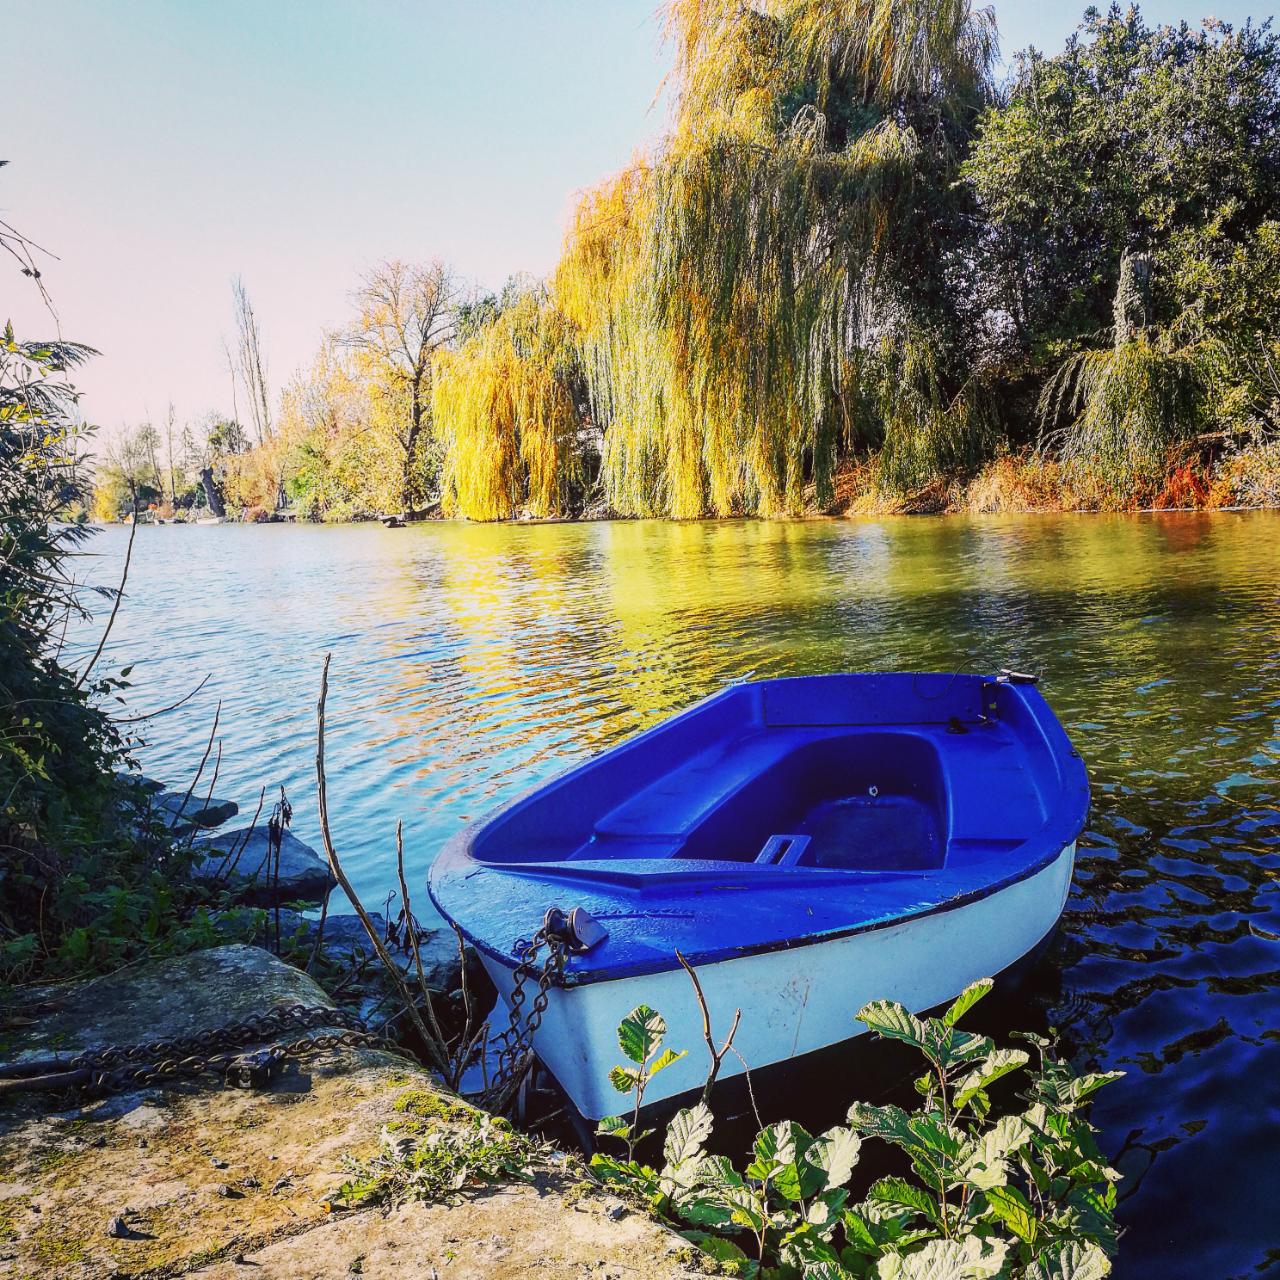 Photo 1: Balade à vélo dans le Marais Poitevin